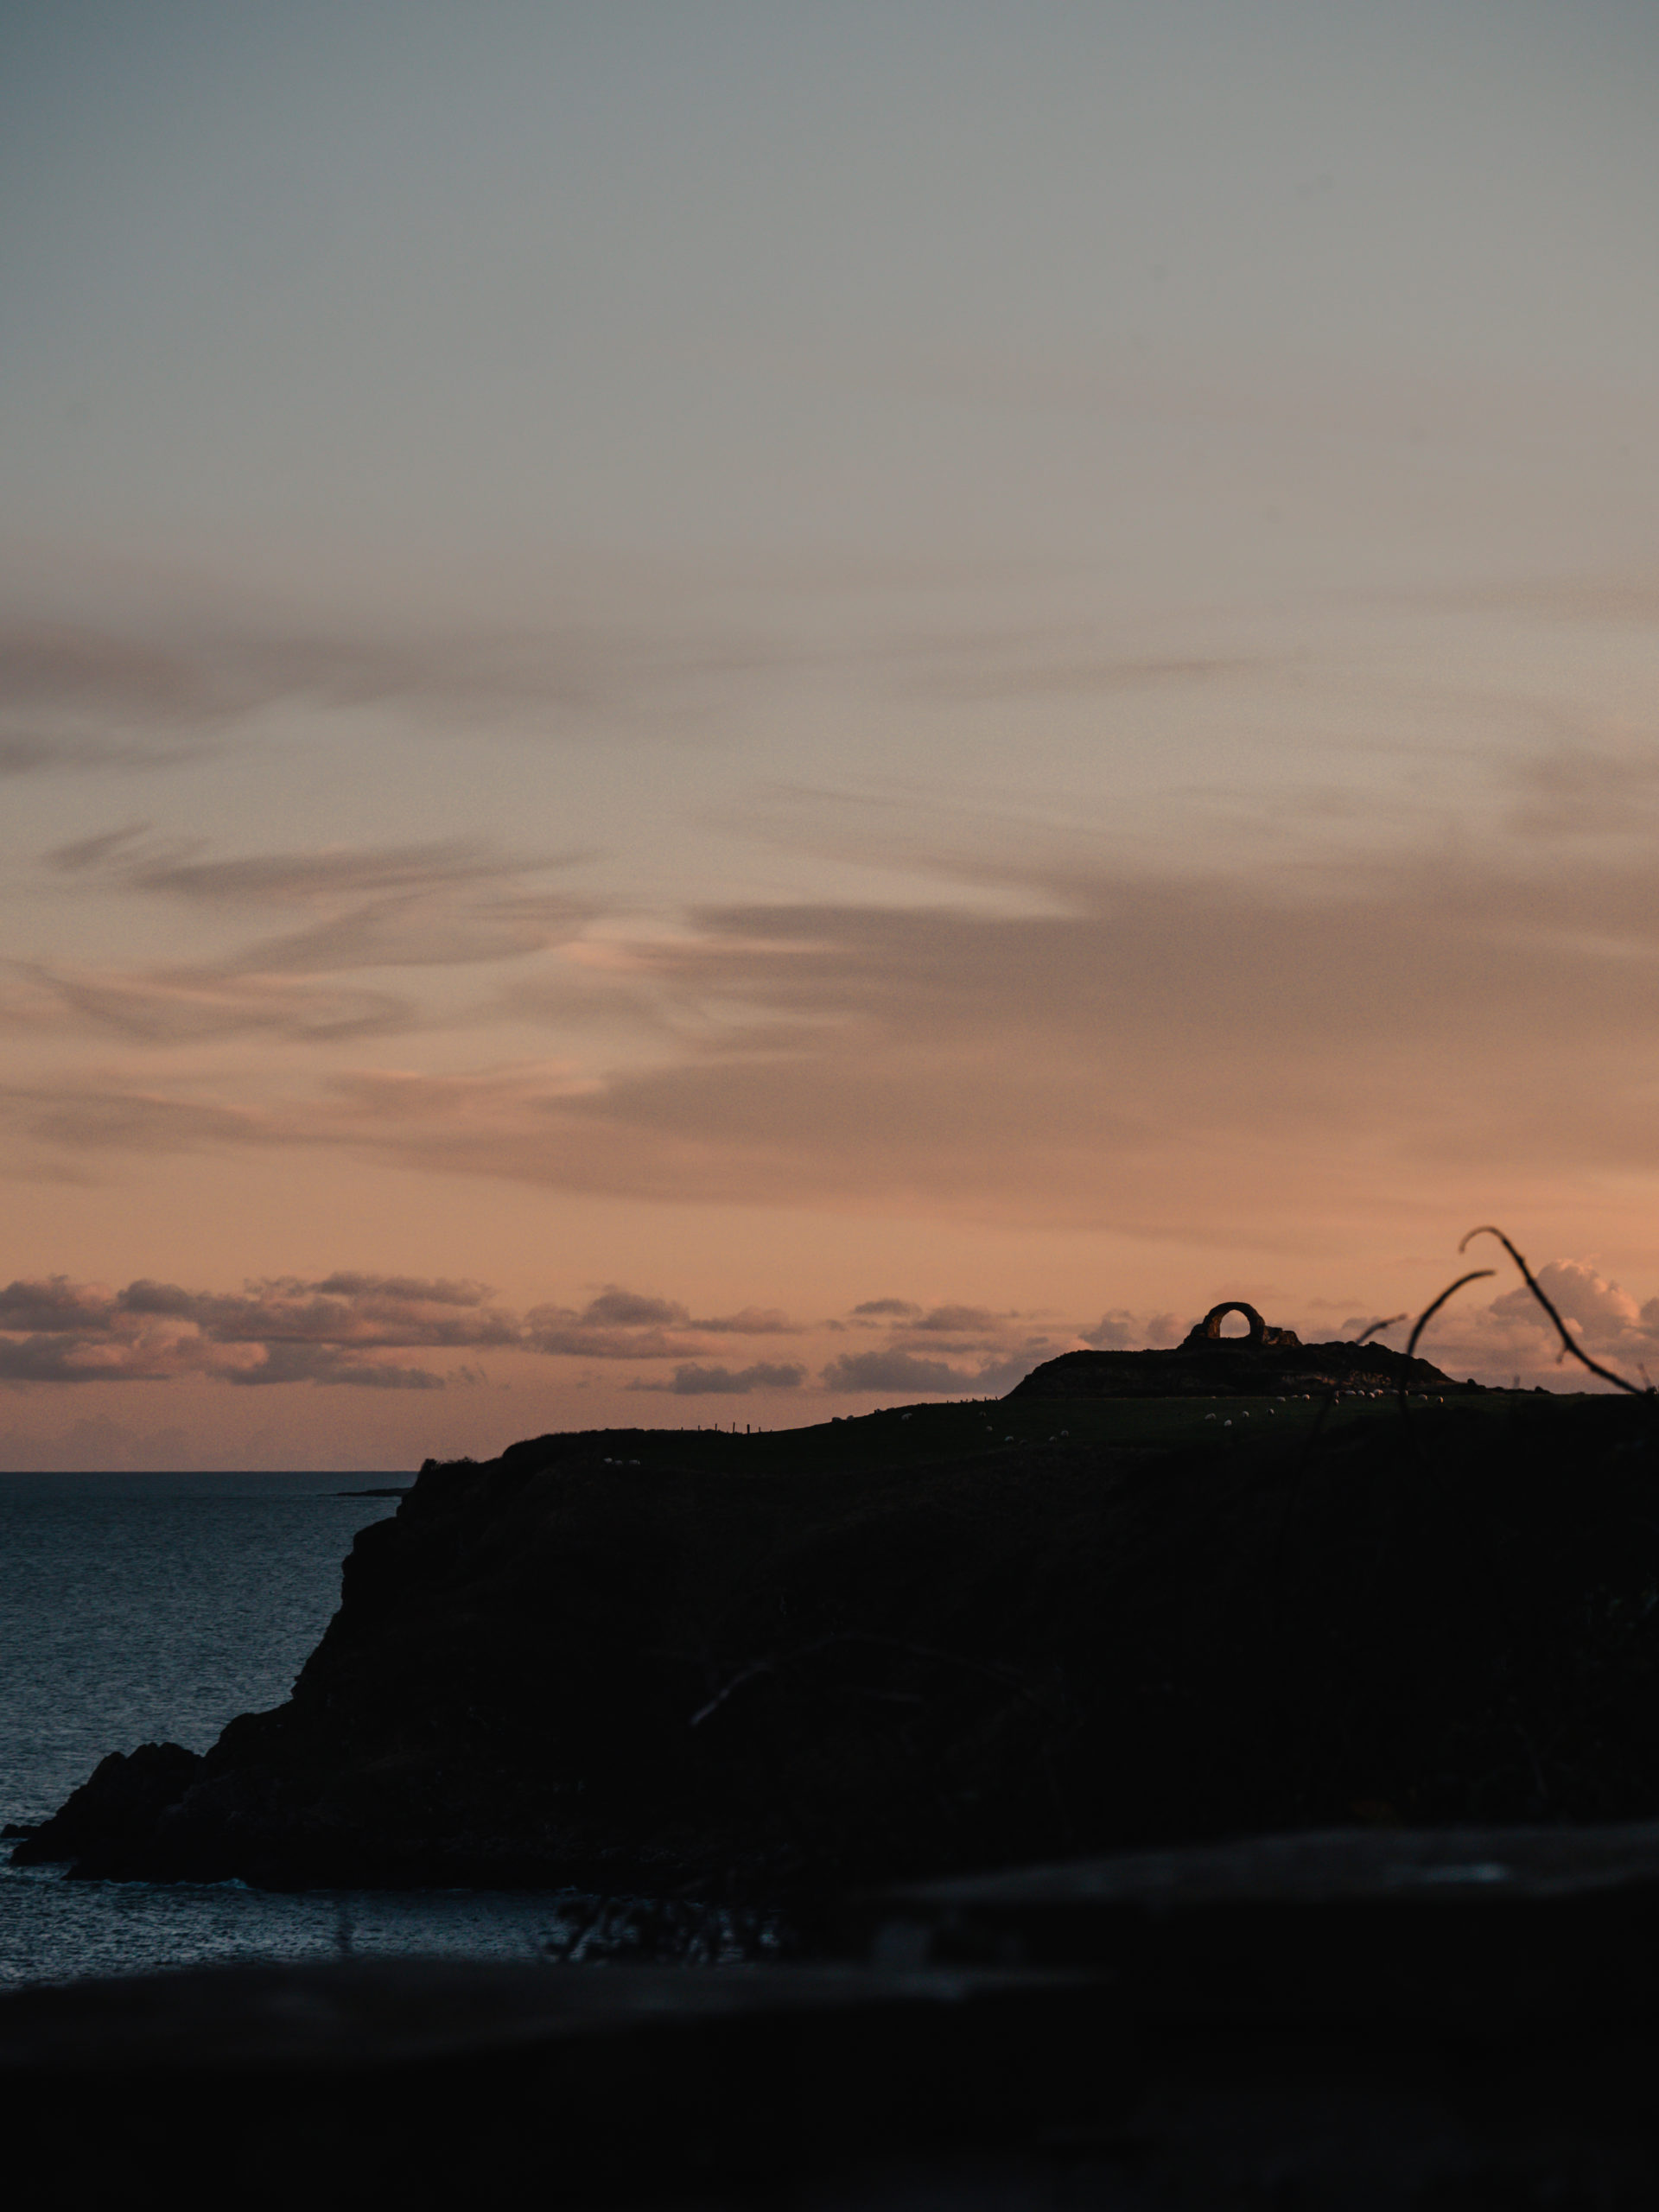 cruggleton castle scotland écosse promenage coucher de soleil mer